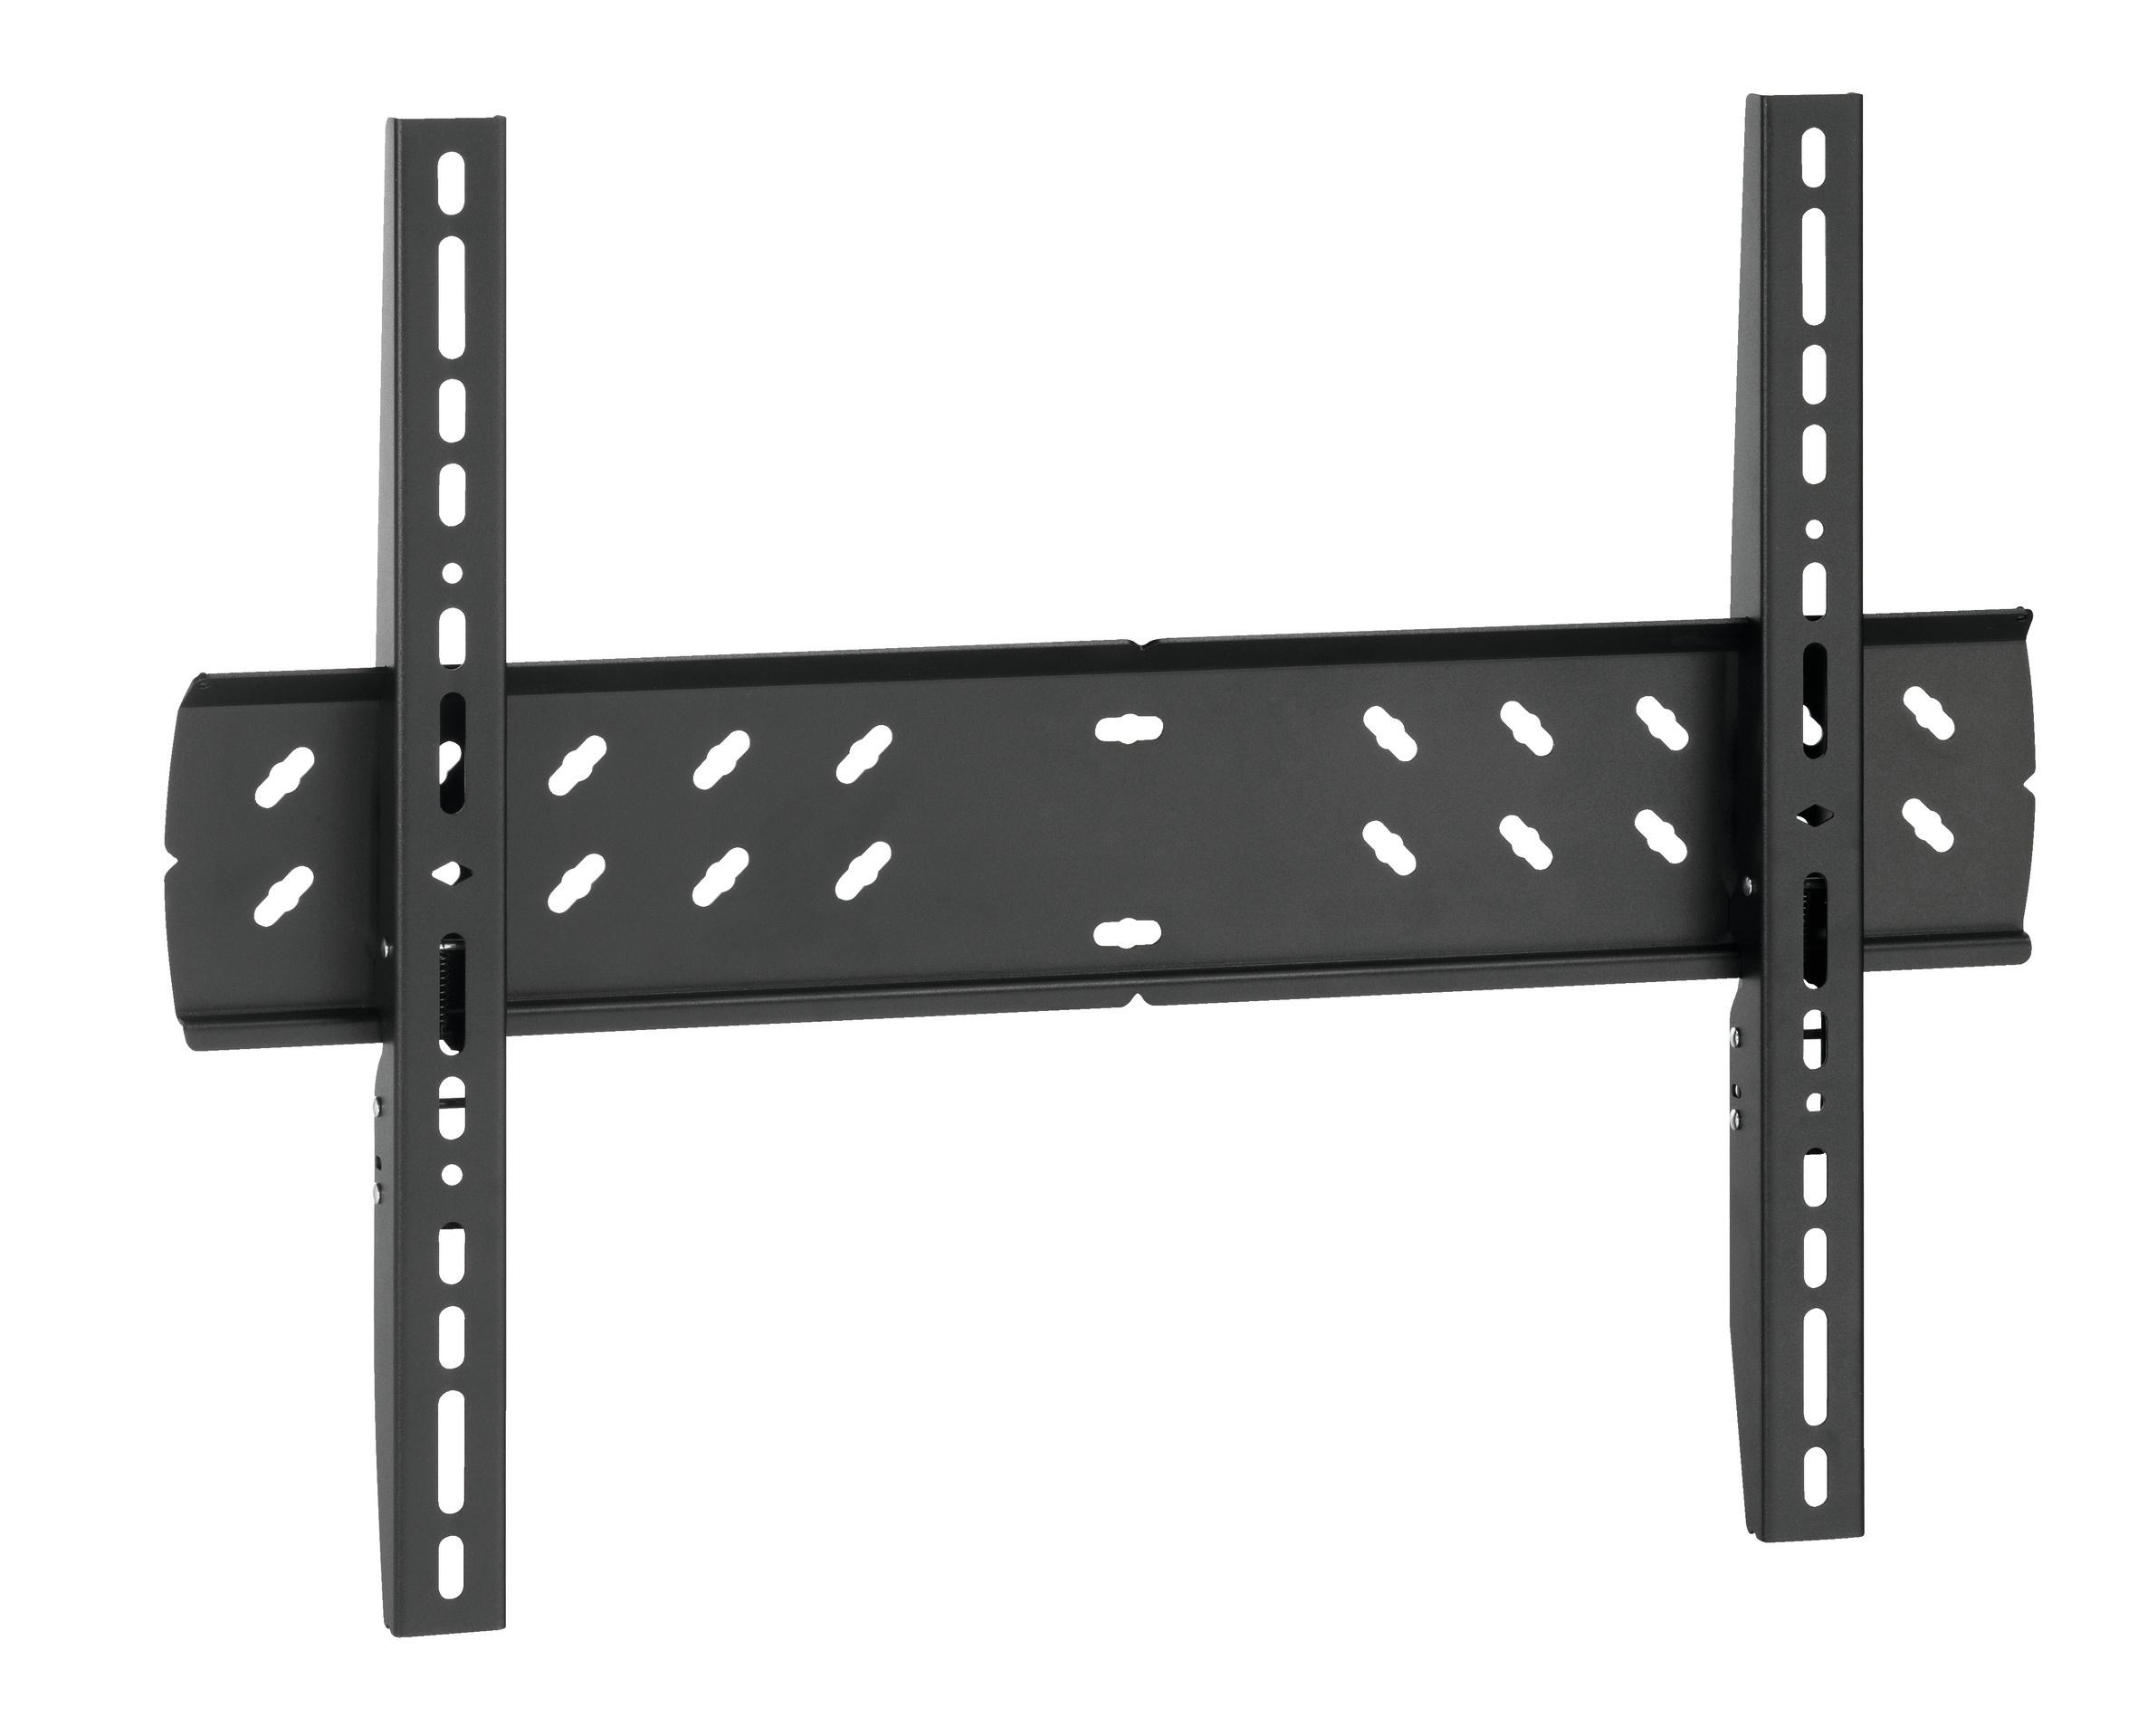 Vogel's PFW 5300 Super flat wall mount